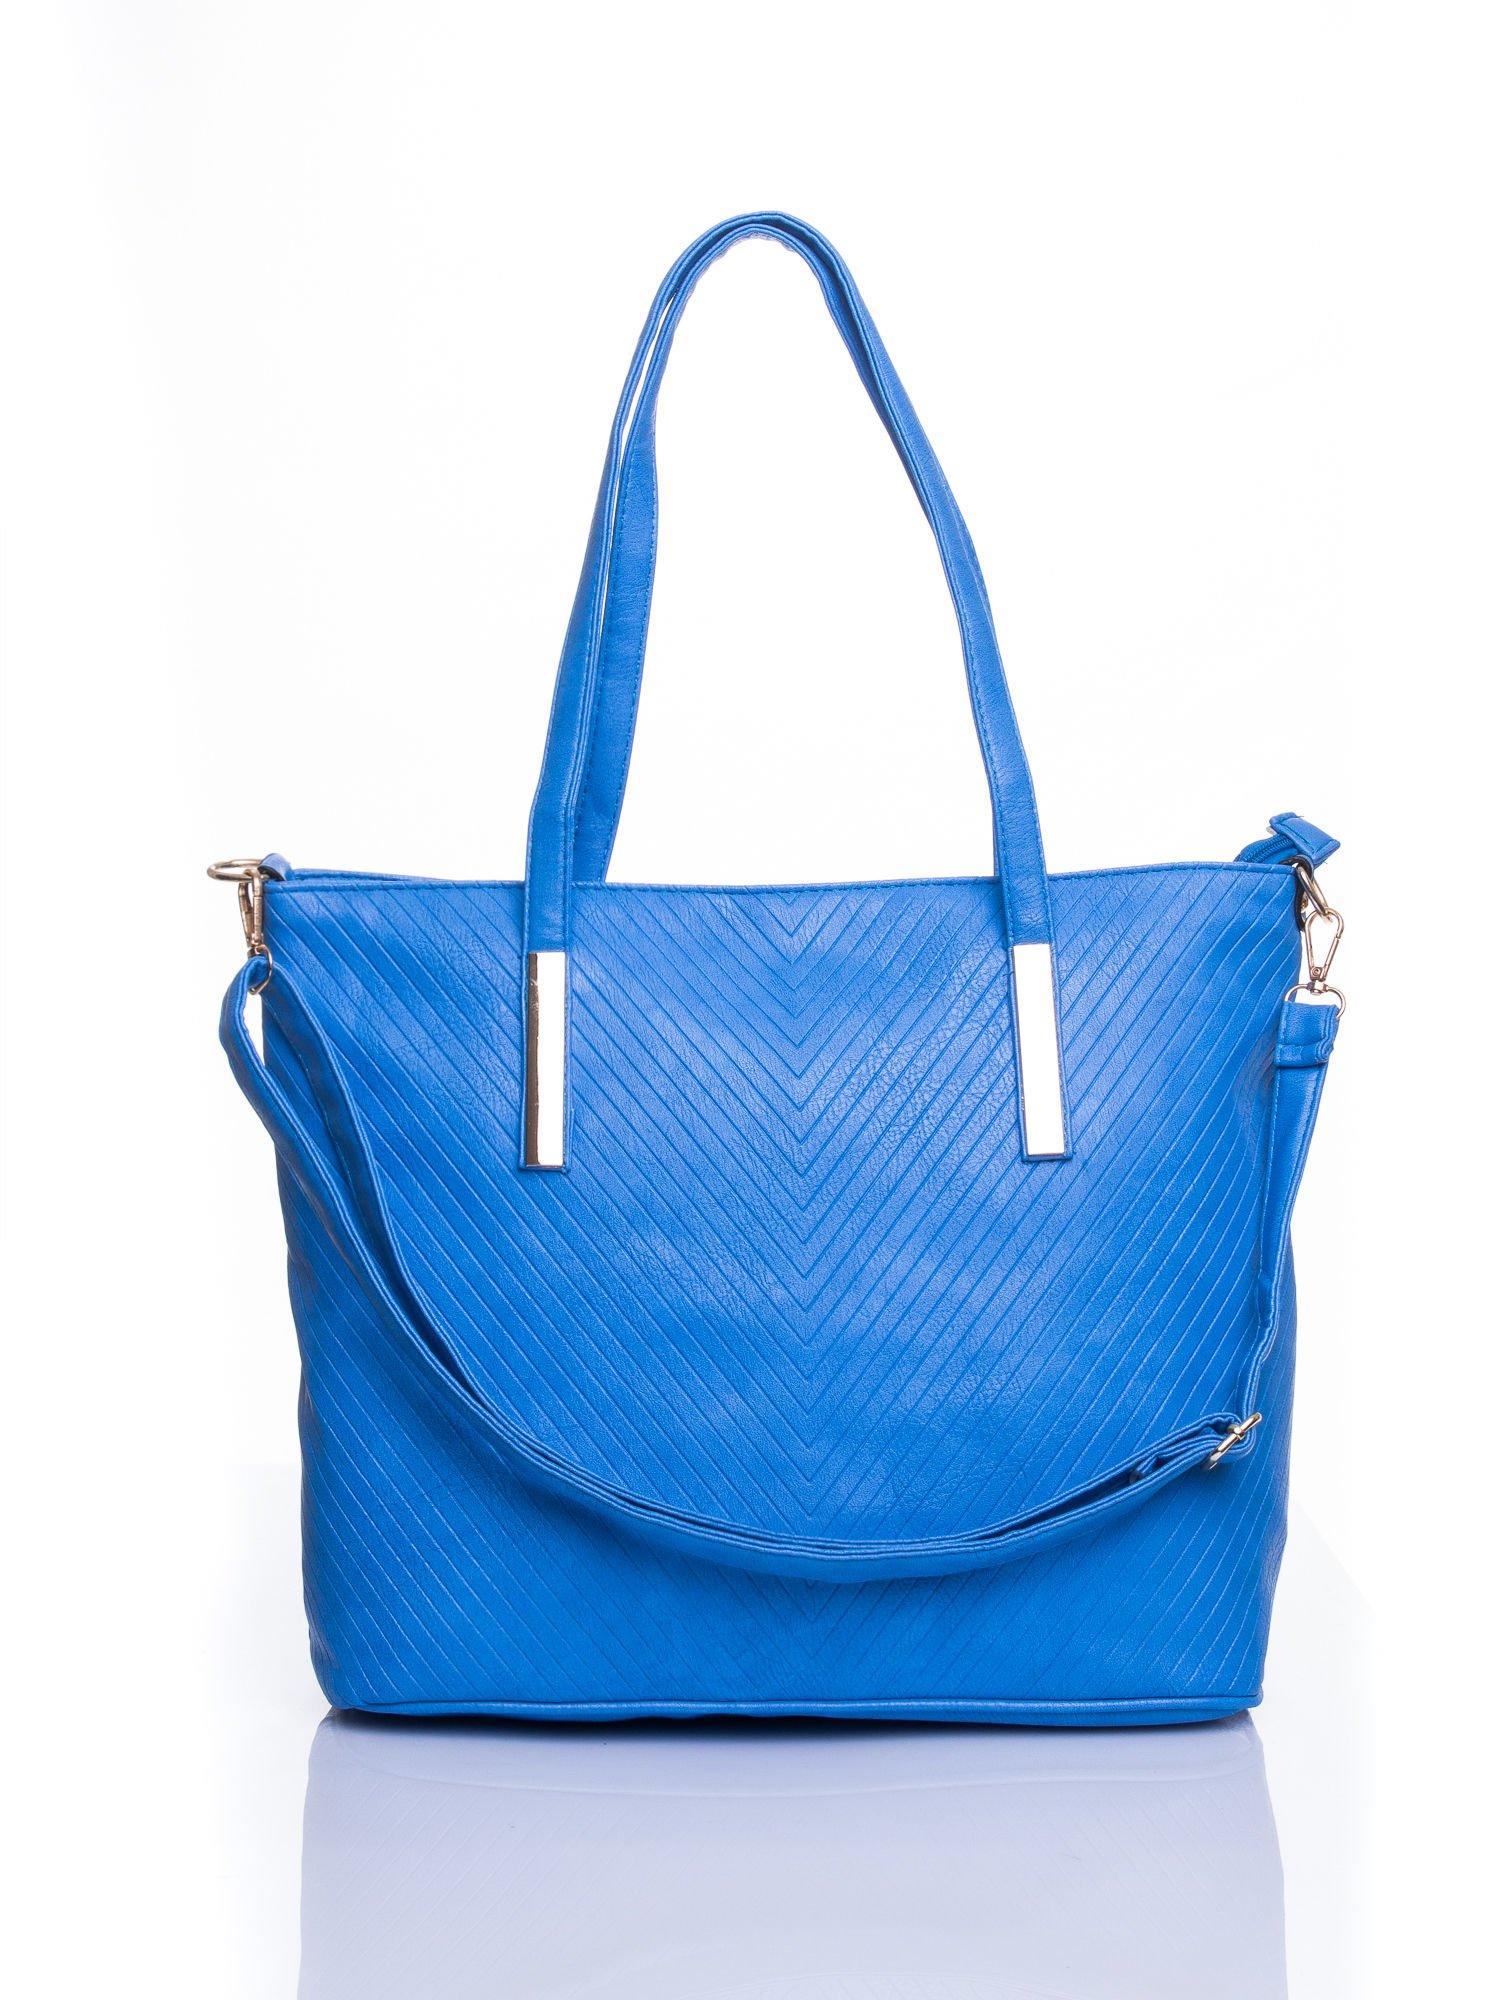 Niebieska fakturowana torba shopper bag                                  zdj.                                  1